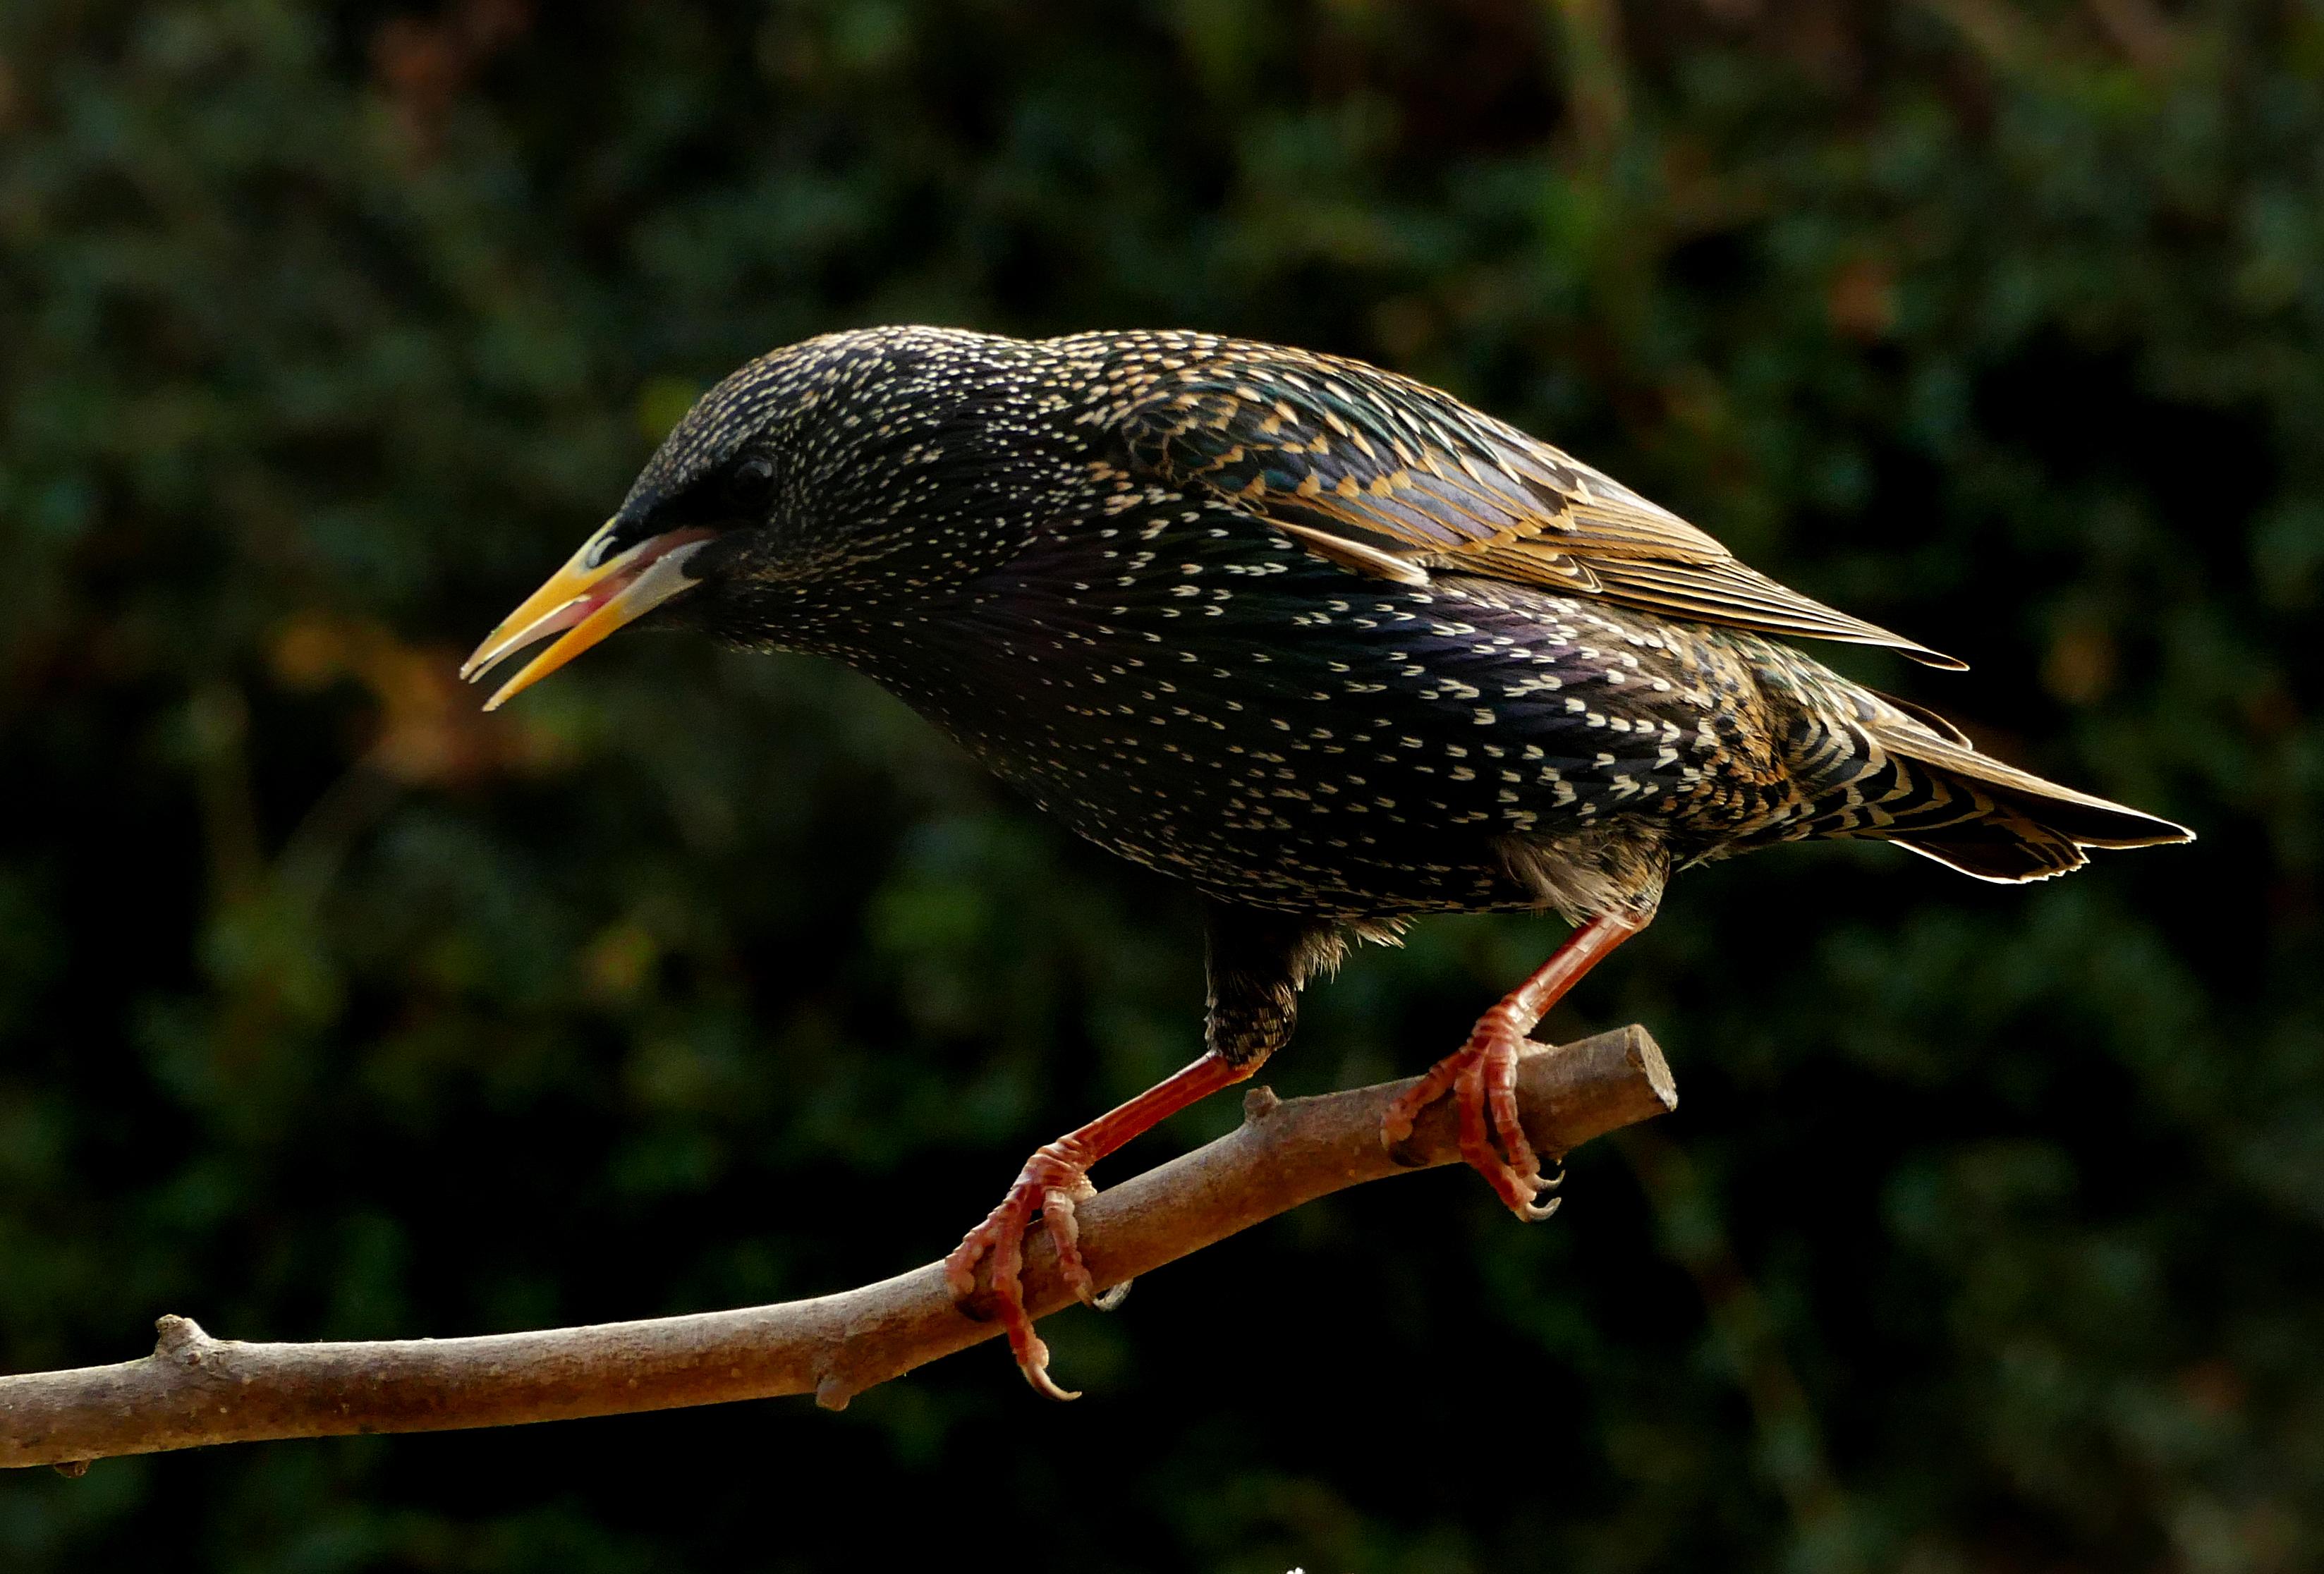 Starling (sternus vulgaris) photo